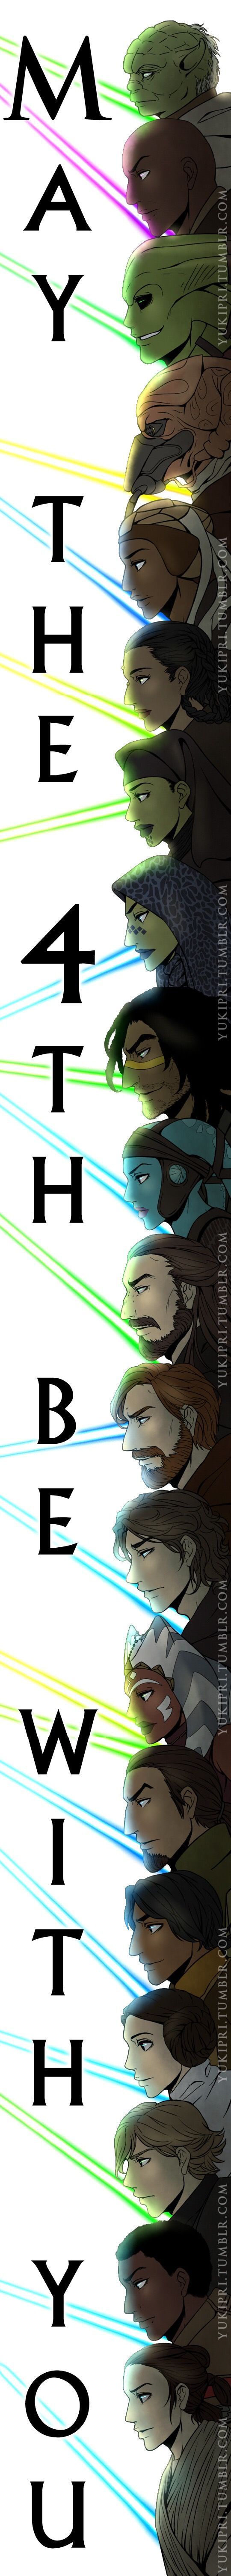 May the 4th be with you! Or in other words, HAPPY STAR WARS DAY!!!Tried to get in as many of my Jedi/Light Side Force sensitive favs as I could. From top to bottom: (Prequels/Clone Wars) Yoda, Mace Windu, Kit Fisto, Plo Koon, Adi Gallia, Depa Billaba, Luminara Unduli, Barriss Offee, Quinlan Vos, Aayla Secura, Qui-Gon Jinn, Obi-Wan Kenobi, Anakin Skywalker, Ahsoka Tano, (Rebels) Kanan Jarrus, Ezra Bridger, (Original Trilogy) Leia Organa, Luke Skywalker, (TFA) Finn, and Rey.